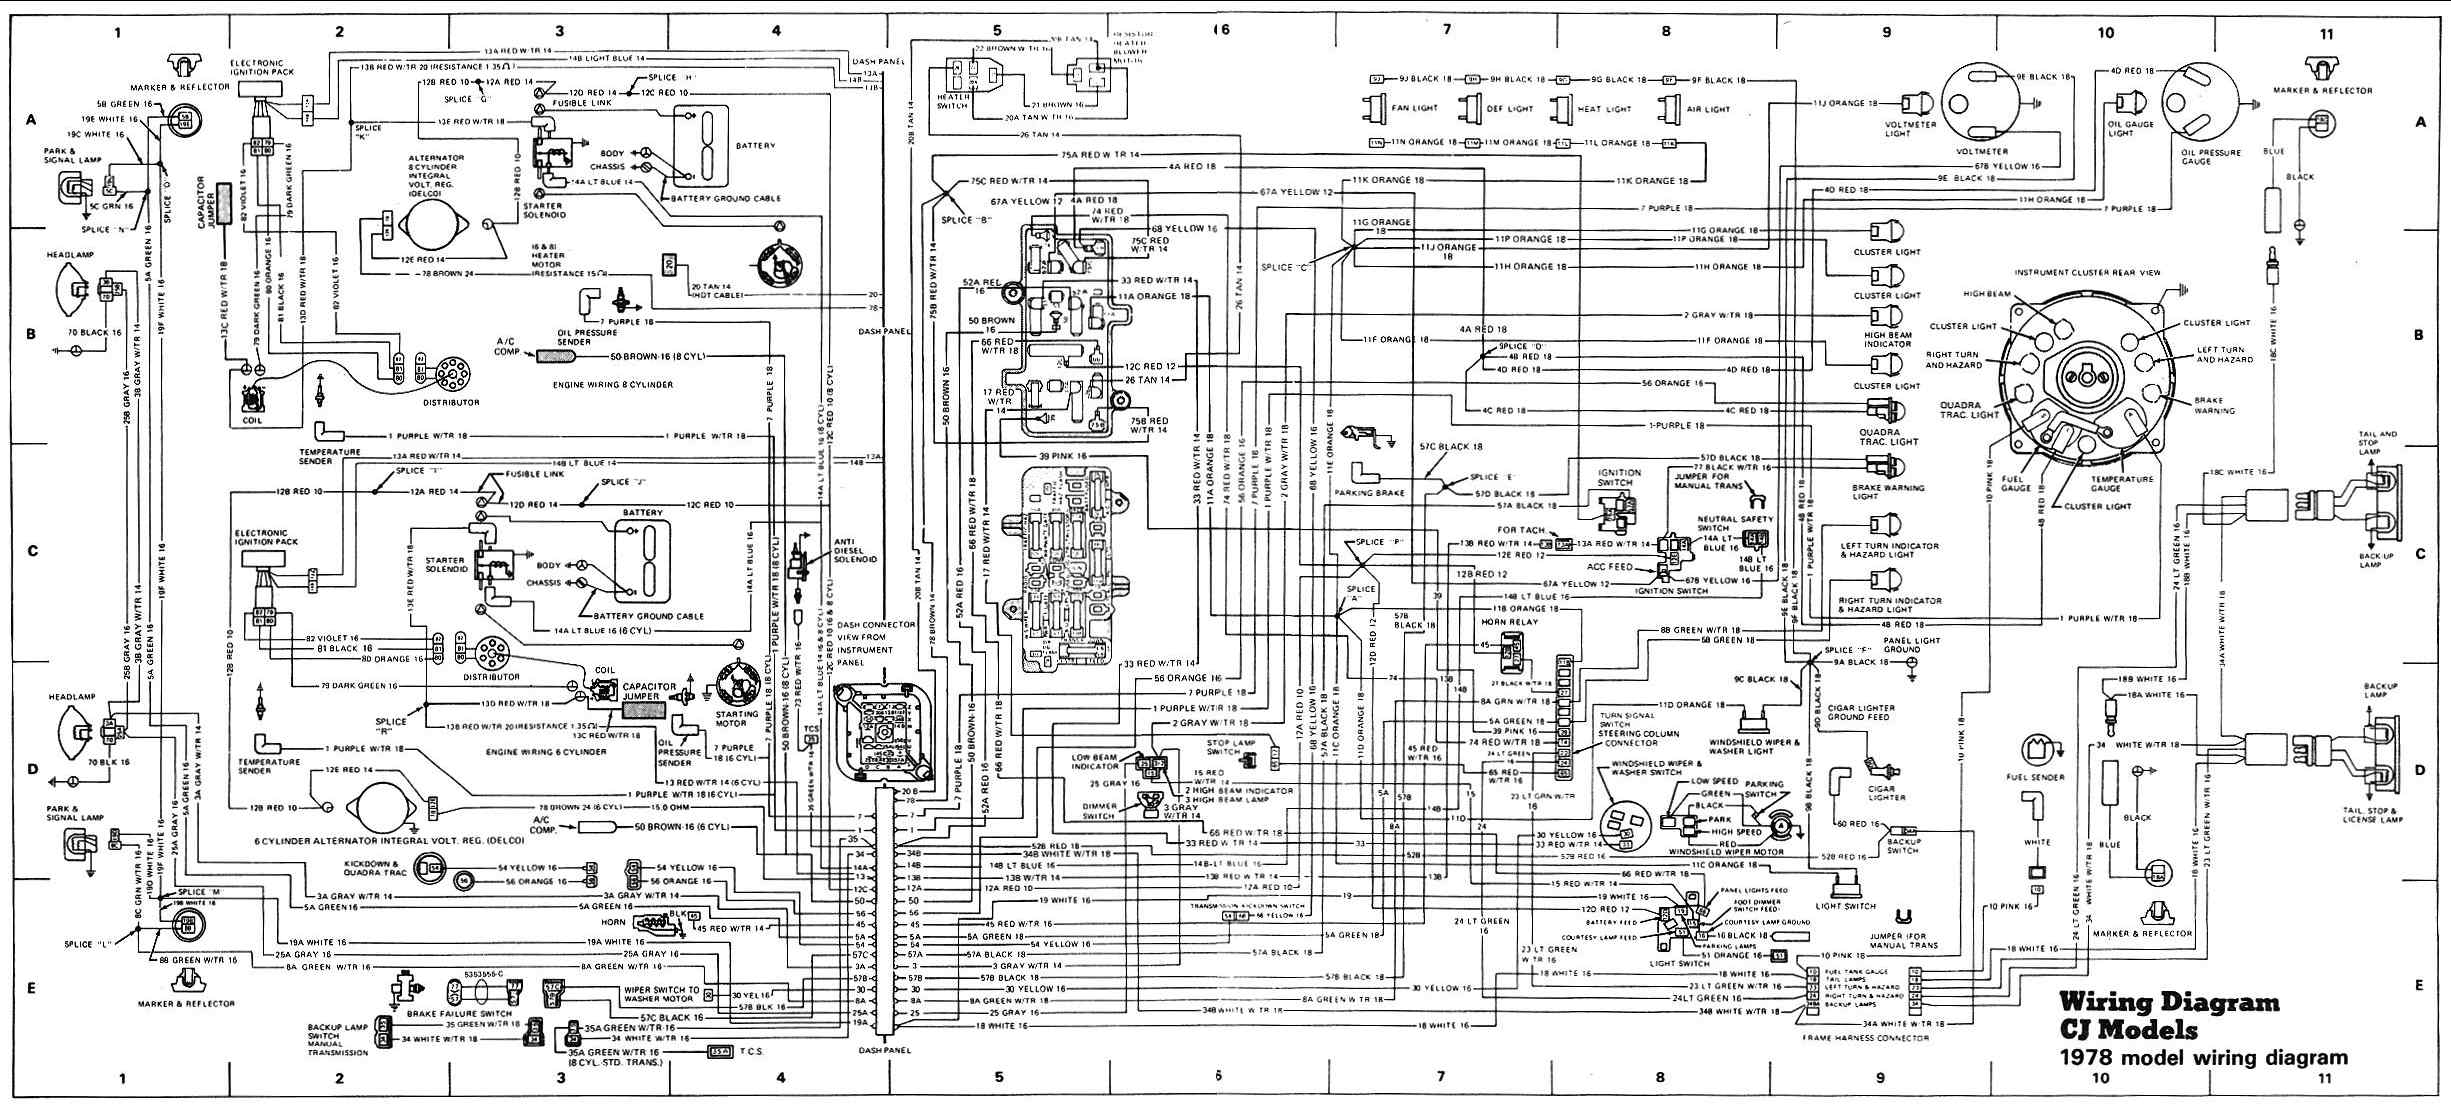 jeep car manuals wiring diagrams pdf fault codes rh automotive manuals net jeep jk tailgate wiring diagram jeep jk headlight wiring diagram